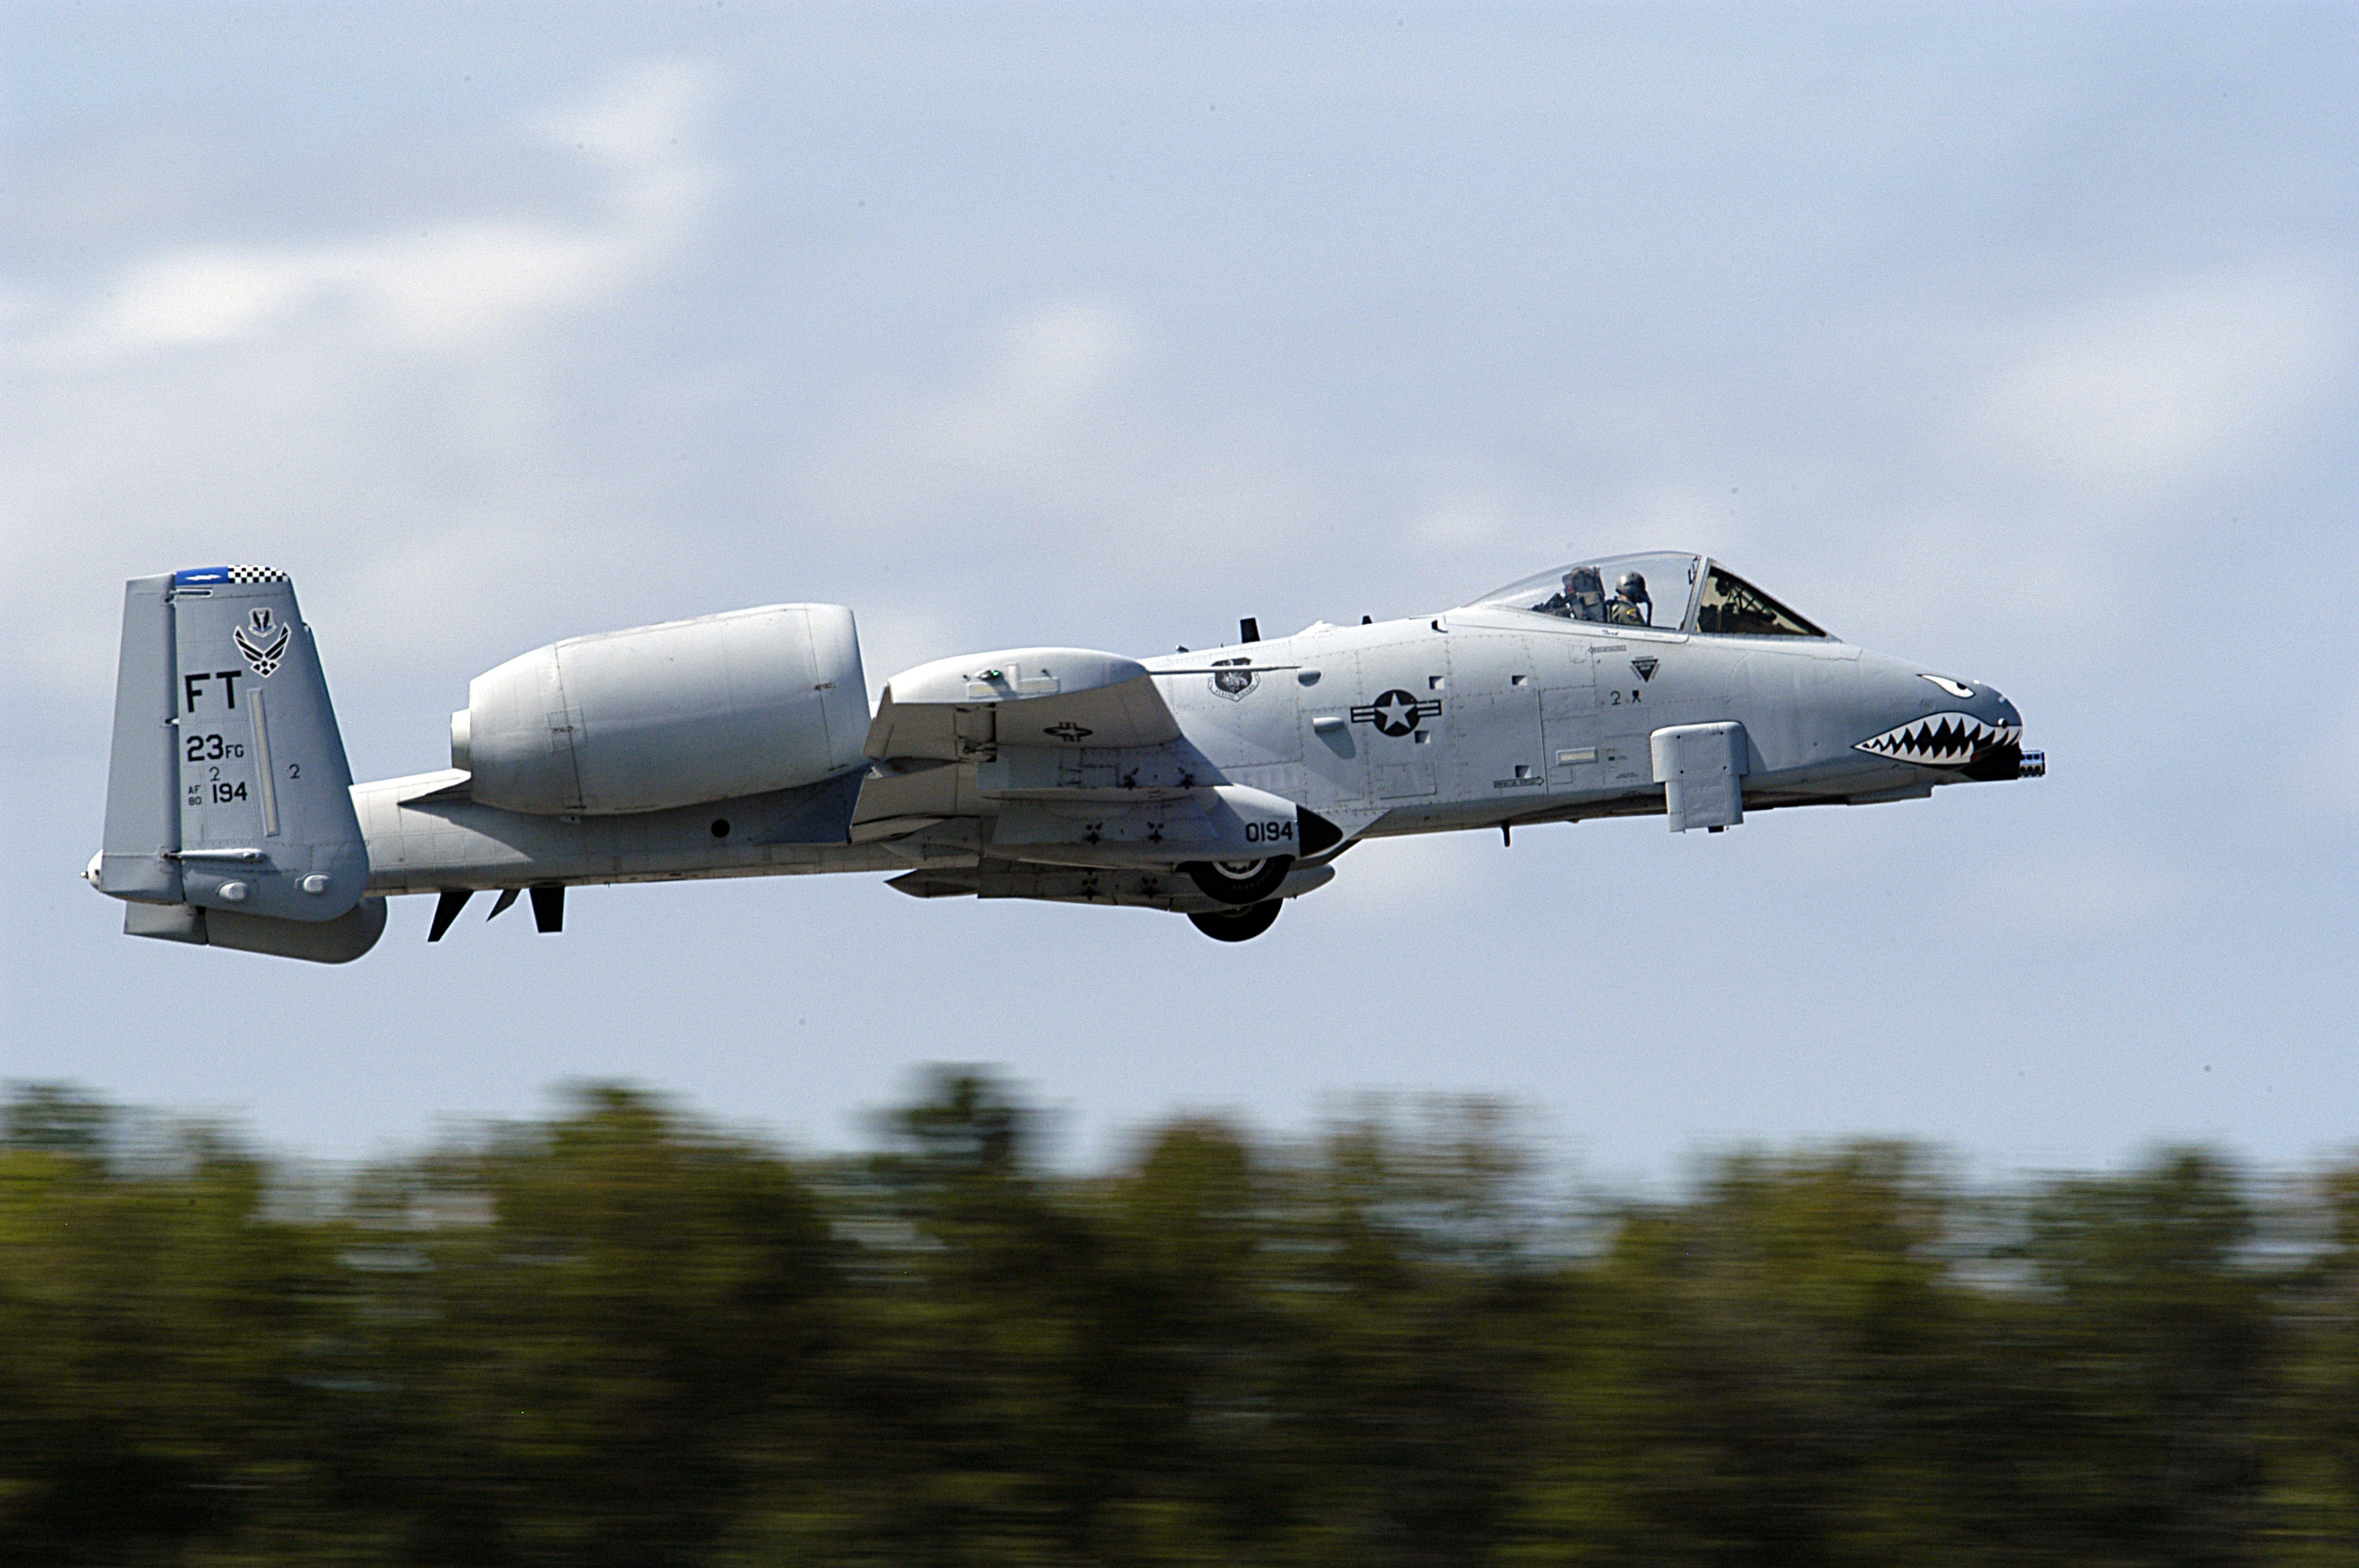 Description A-10 Thunderbolt 040925-N-0295M-087.jpg